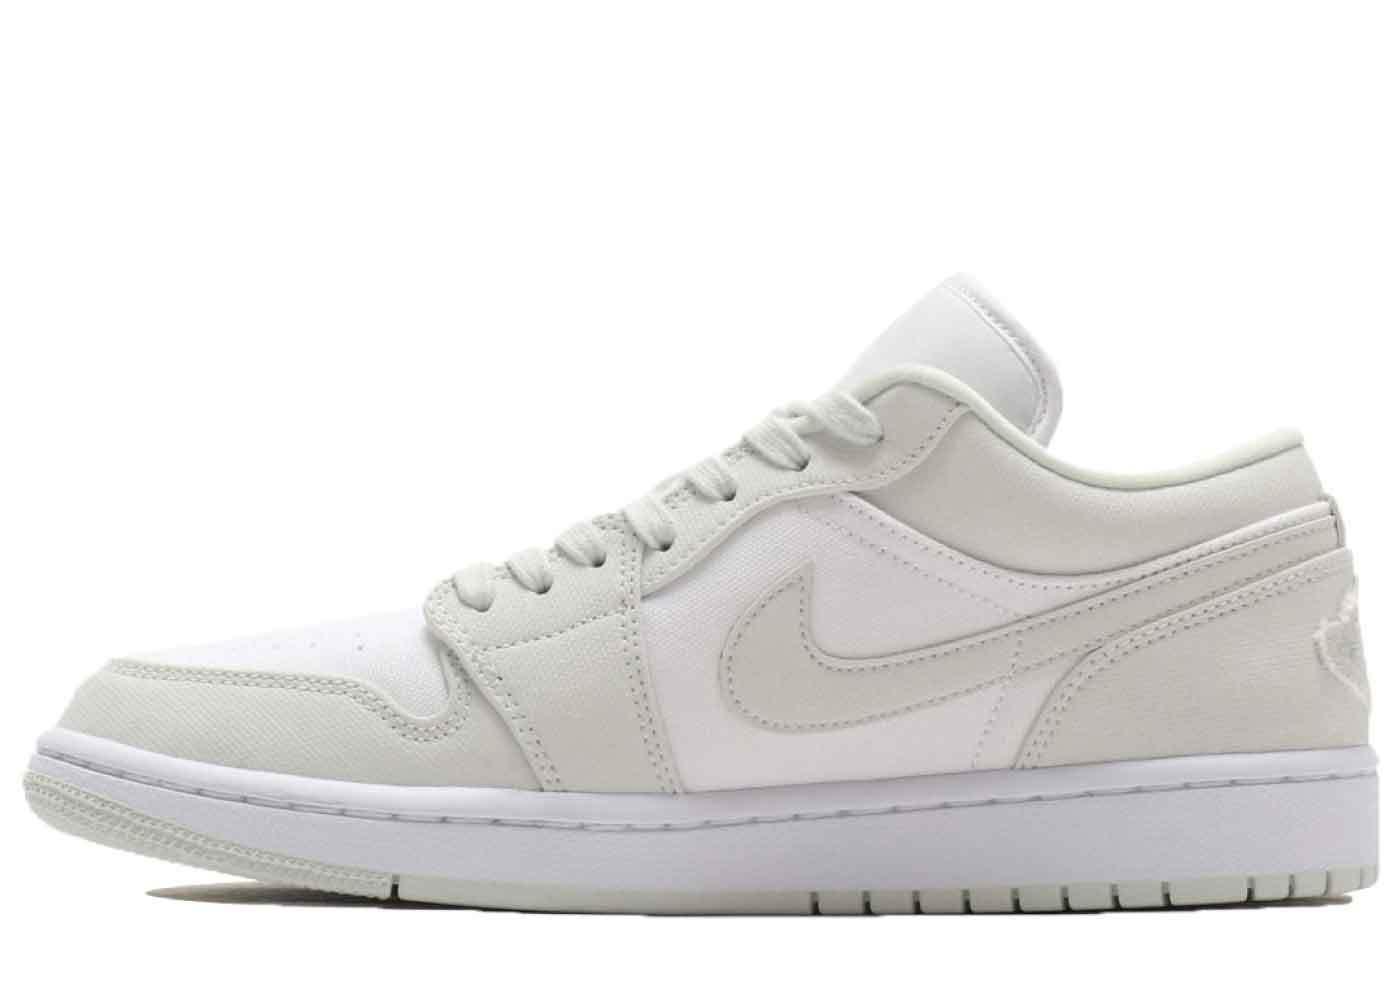 Nike Air Jordan 1 Low White/Spruce Aura Womensの写真